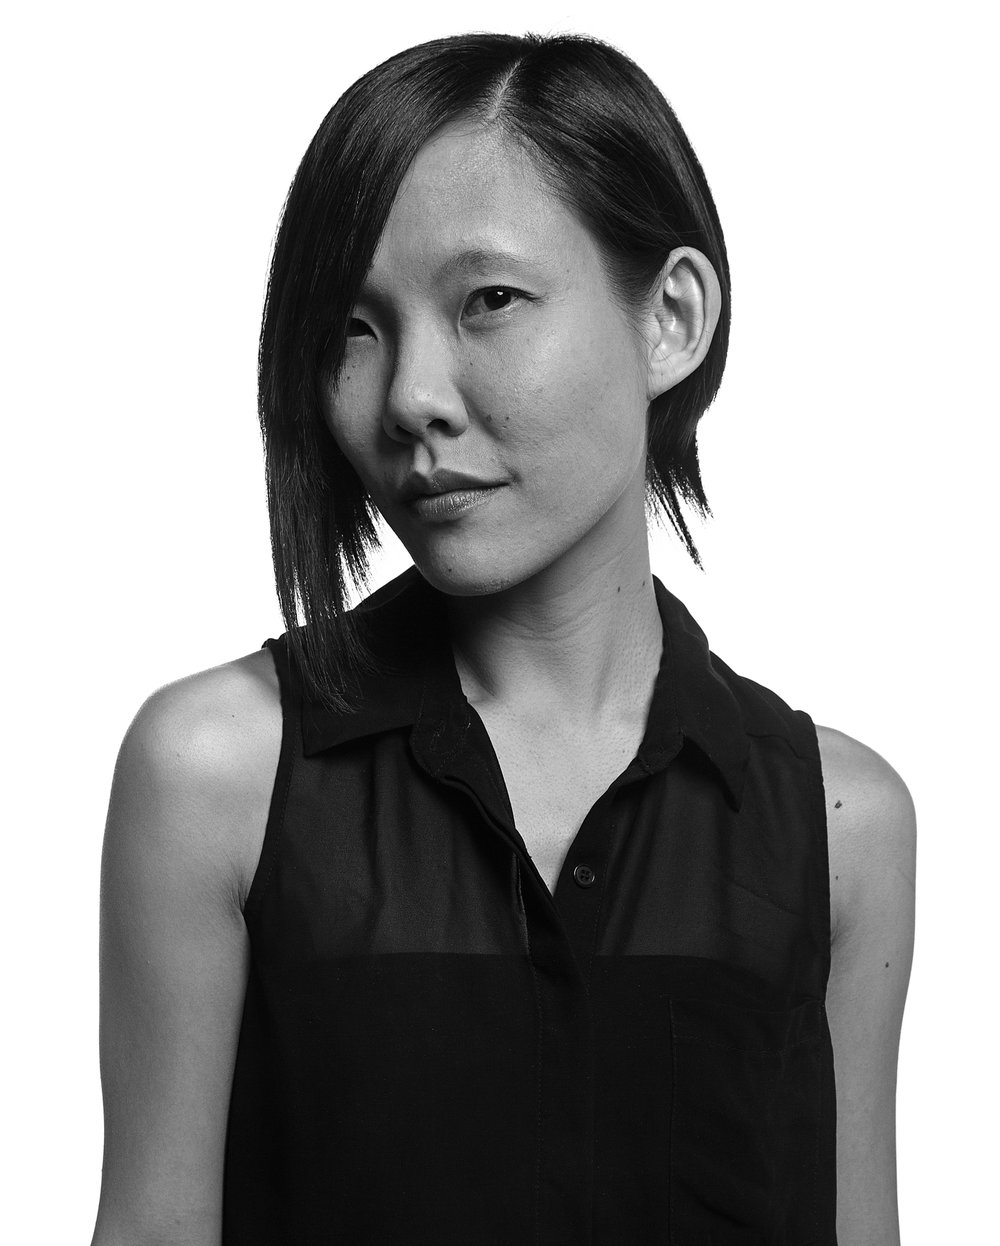 ACCD_Enviro_507-grads-in-studio-portraits-corporate.jpg